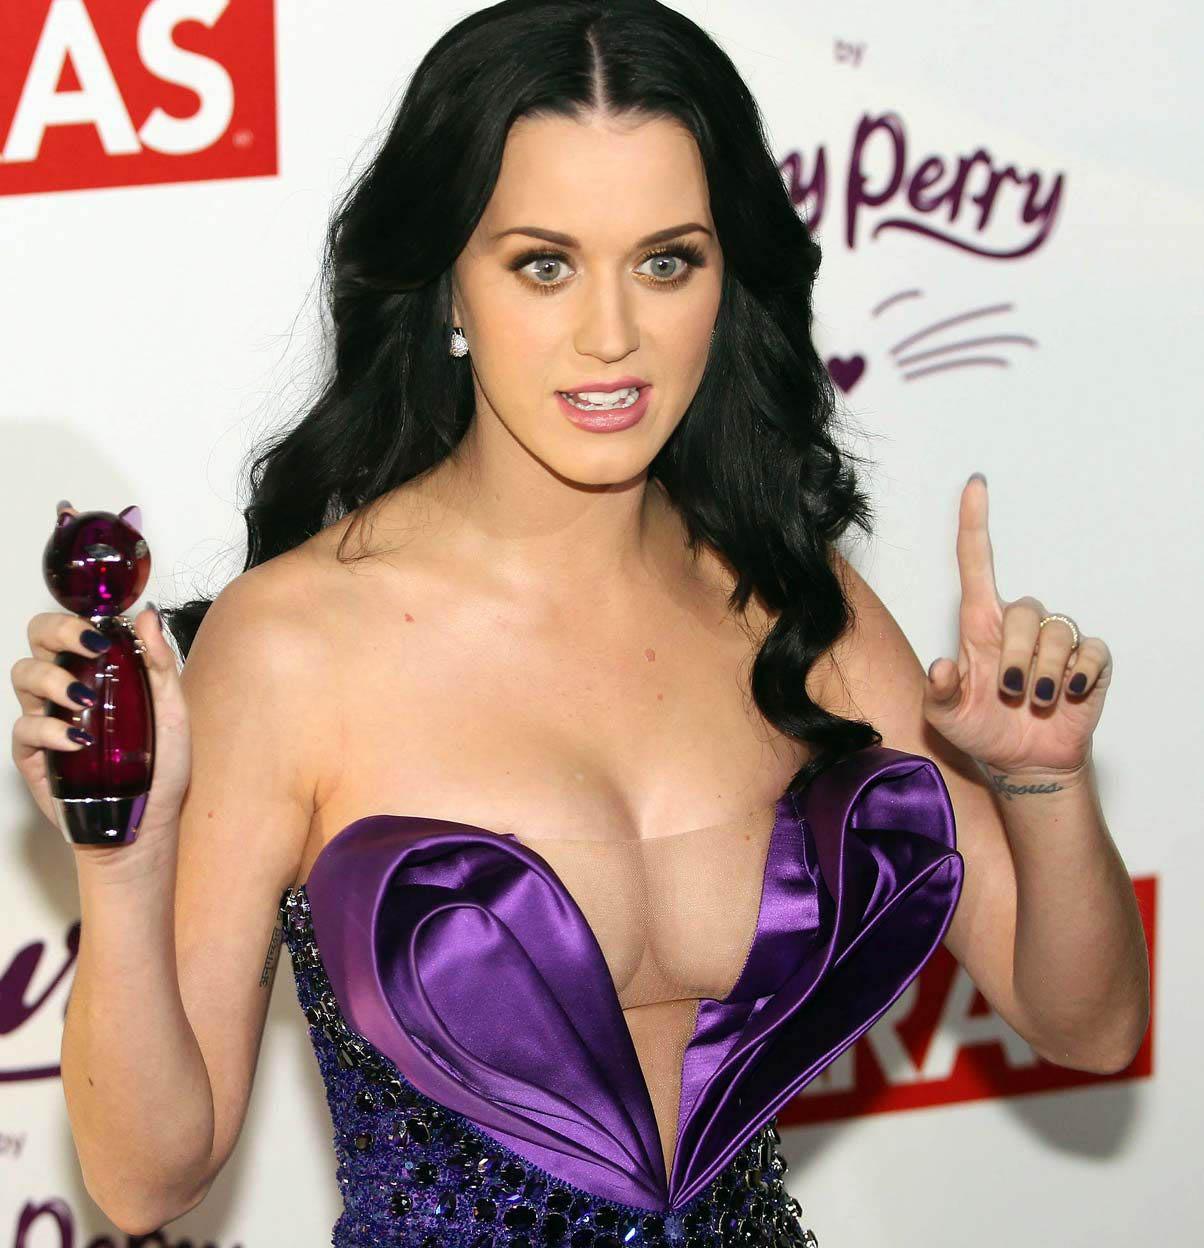 http://4.bp.blogspot.com/-fJ_BtQhM3Zc/TmEUX4GFdeI/AAAAAAAACHY/6ScfI6Wqw80/s1600/katy-perry-huge-cleavage-show-7.jpg